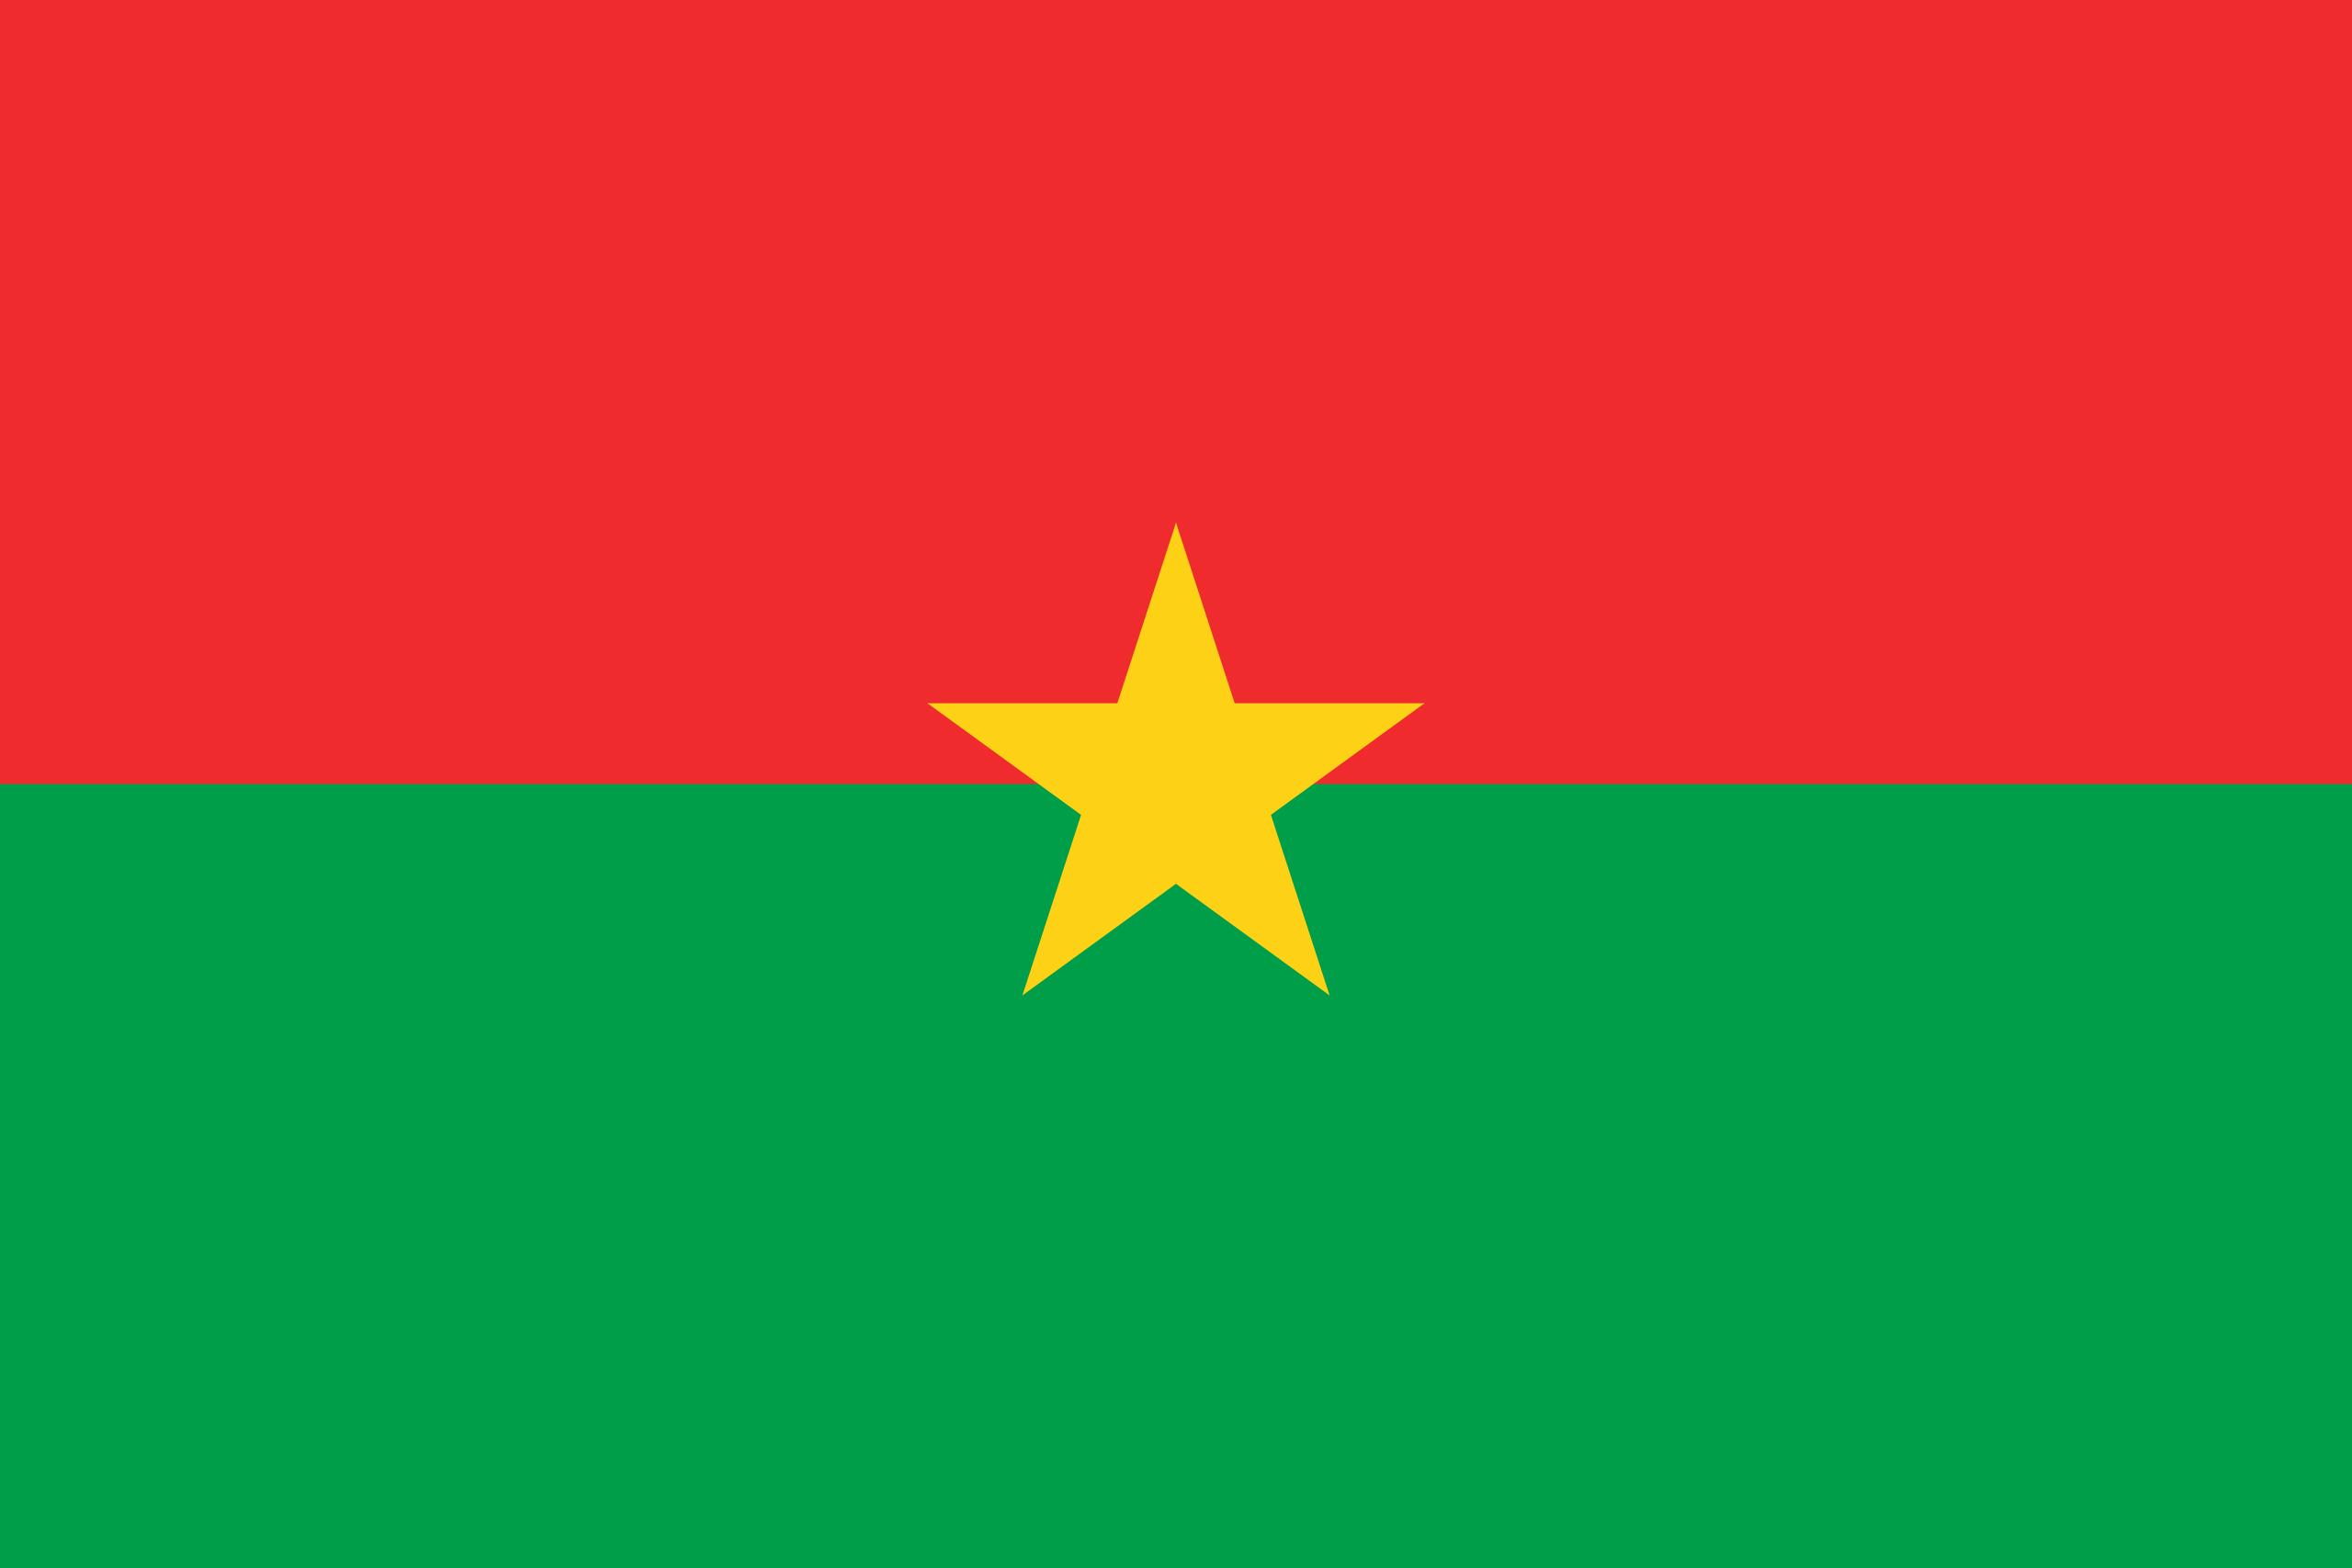 burkina faso, país, emblema, insignia, символ - Обои HD - Профессор falken.com